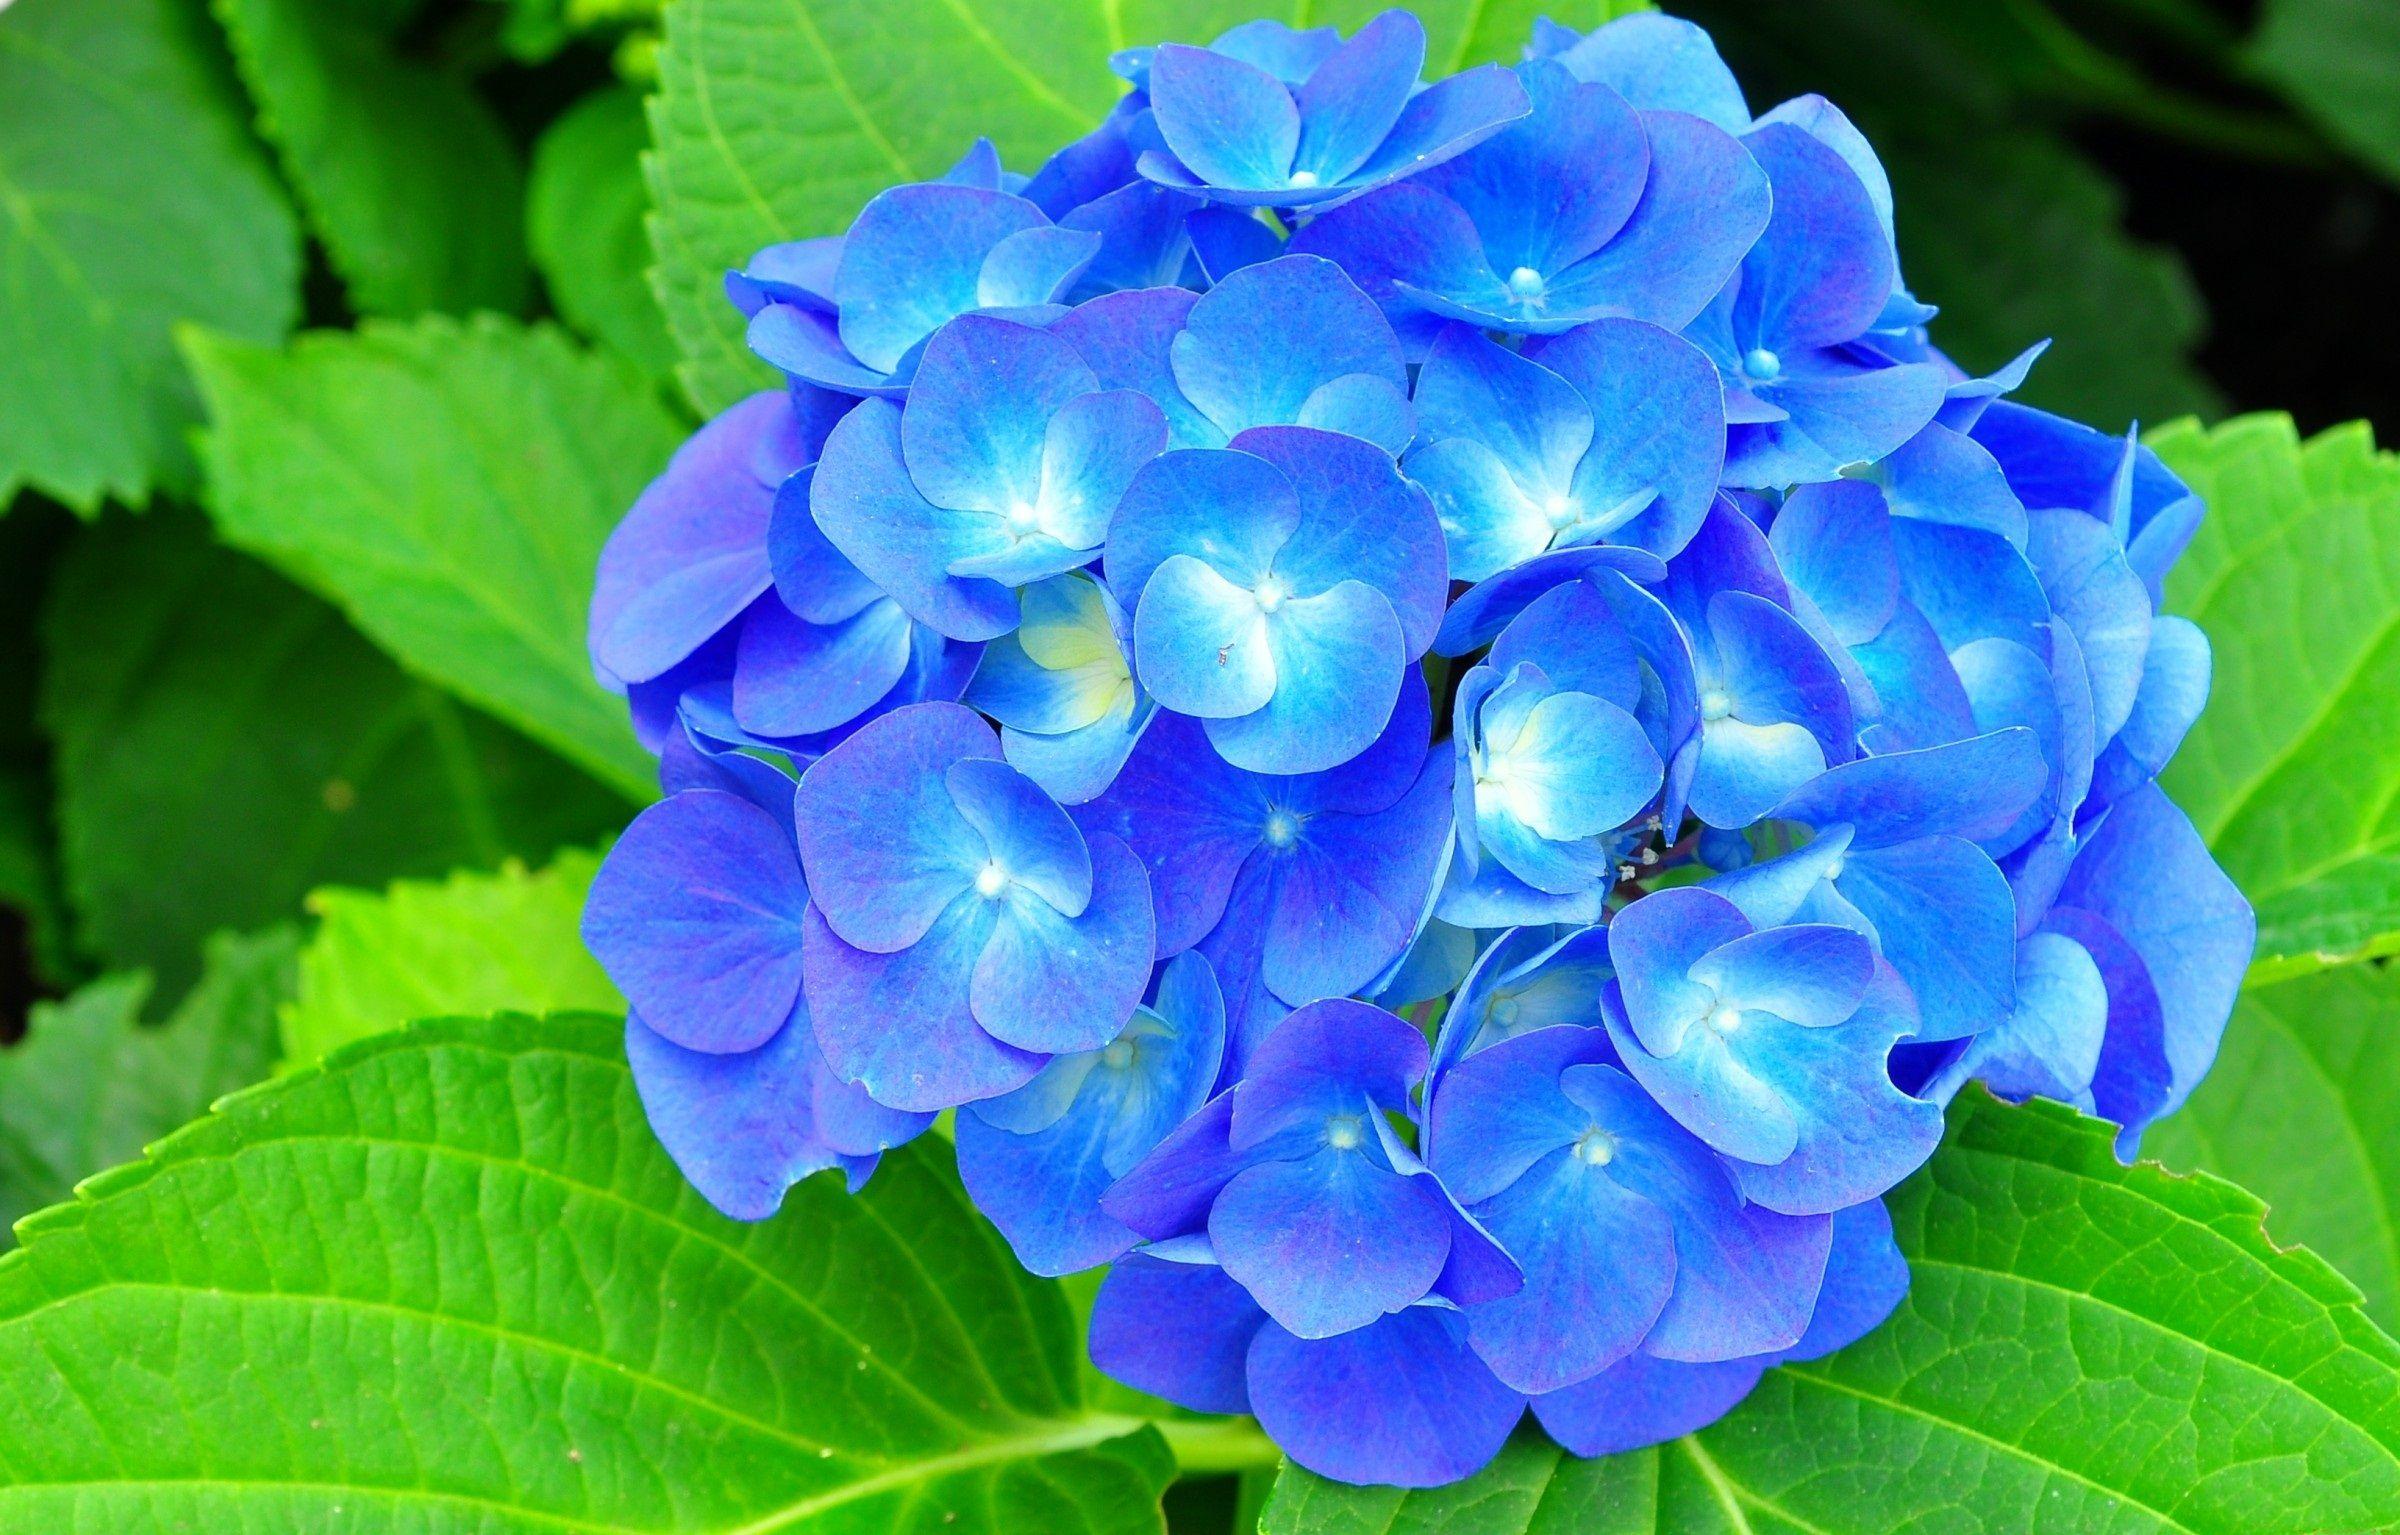 Blue Hydrangeas Flower Picture Hydrangea Flower Pictures Hydrangea Flower Hydrangea Wallpaper